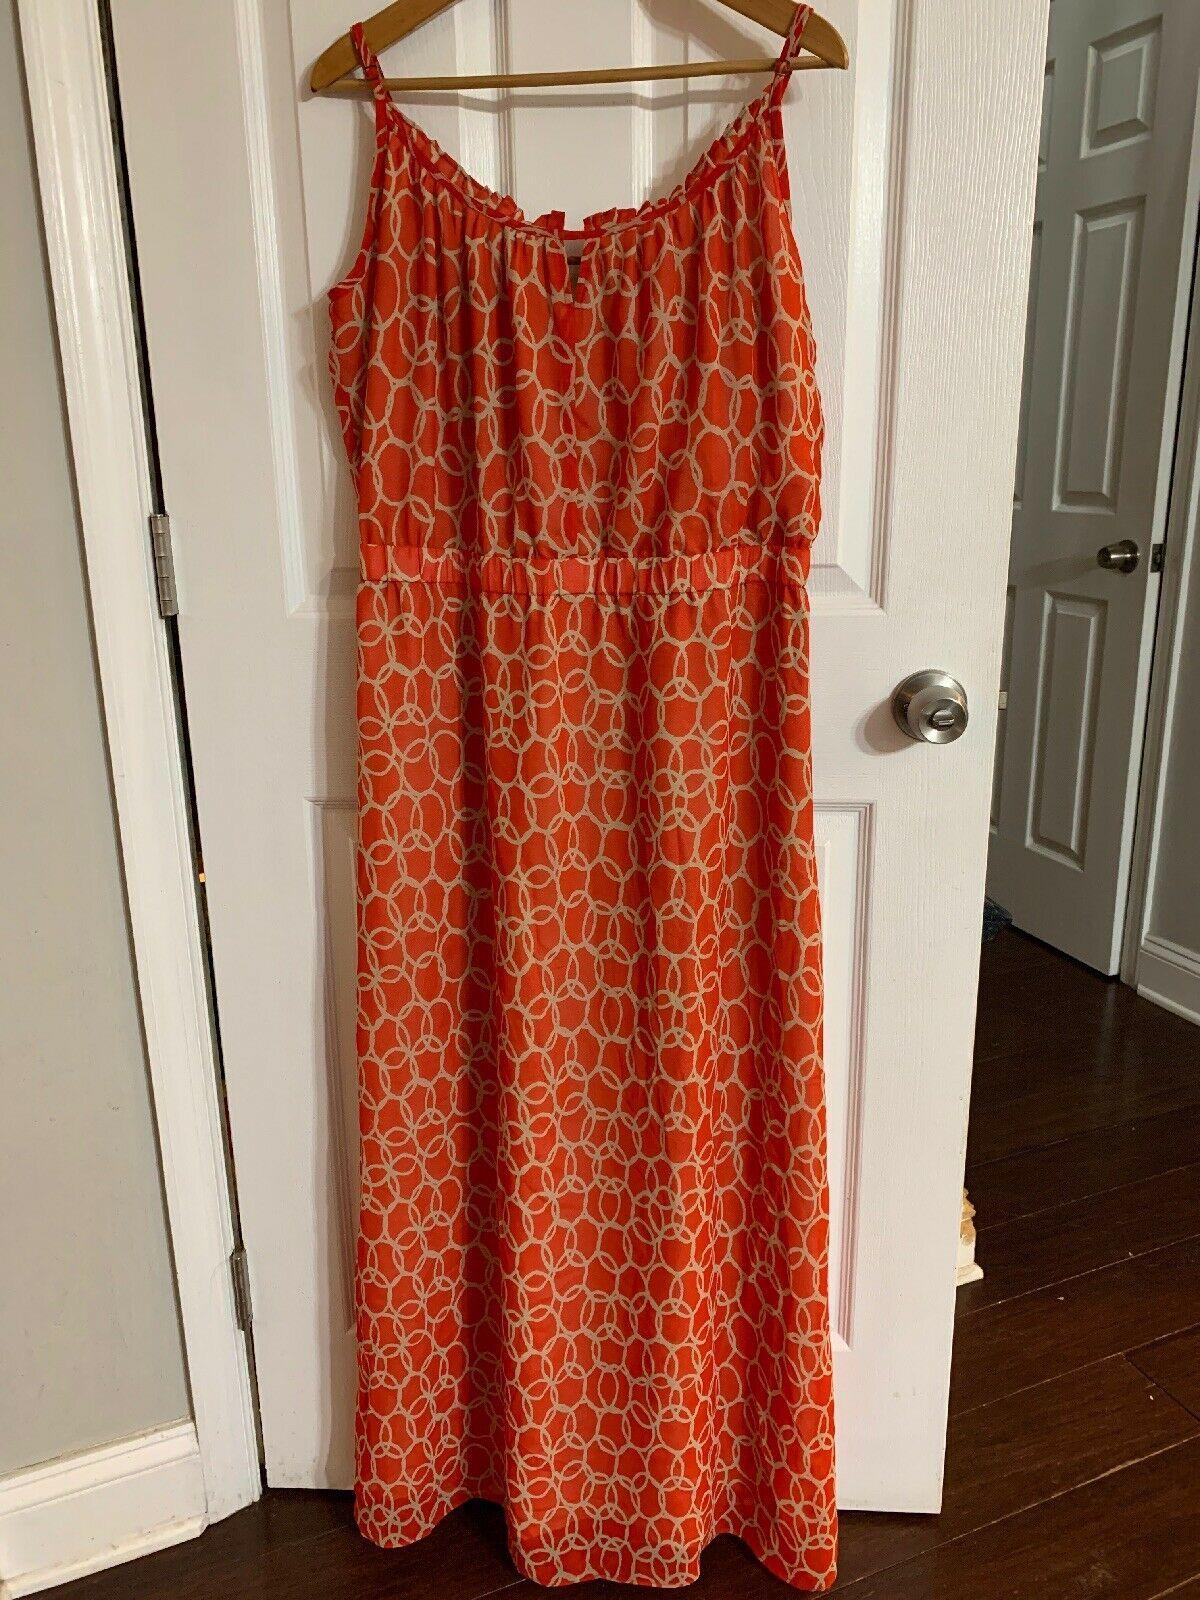 Banana Republic Womens Maxi Dress Size 14 Coral Orange Tan Chain Sleeveless Dress Honey Womens Maxi Dresses Sleeveless Orange Dress [ 1600 x 1200 Pixel ]